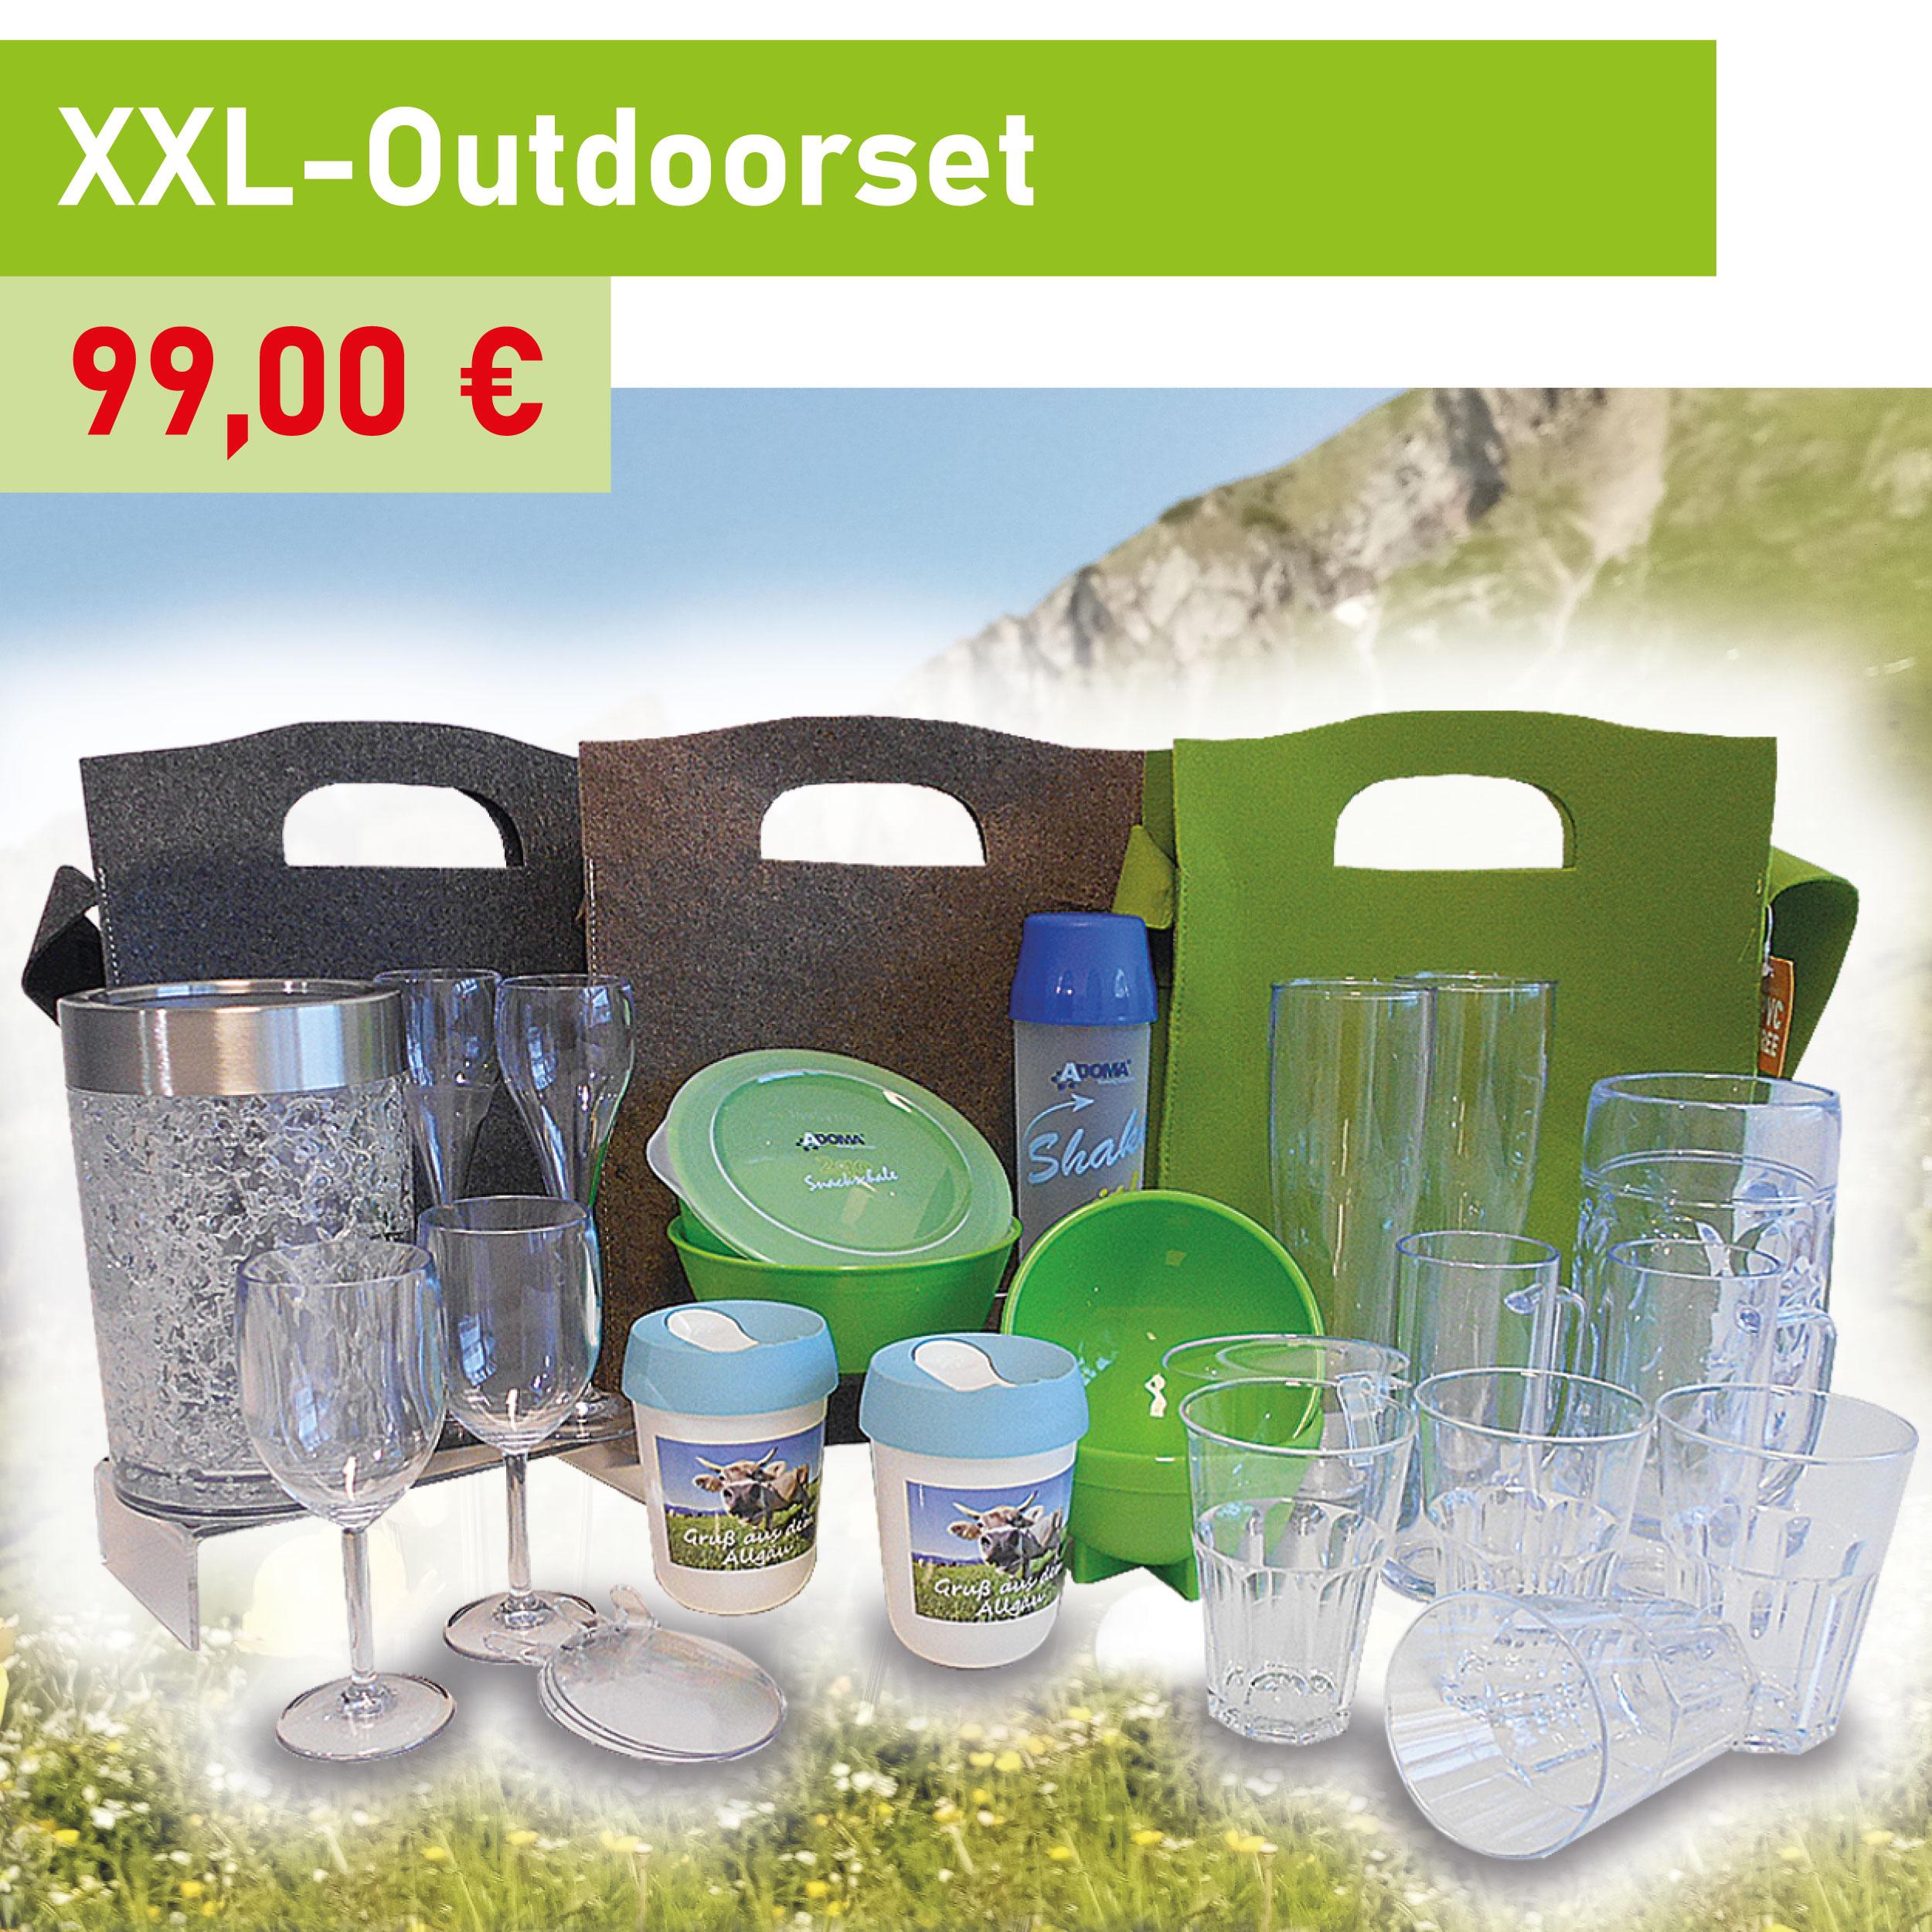 XXL-Outdoorset